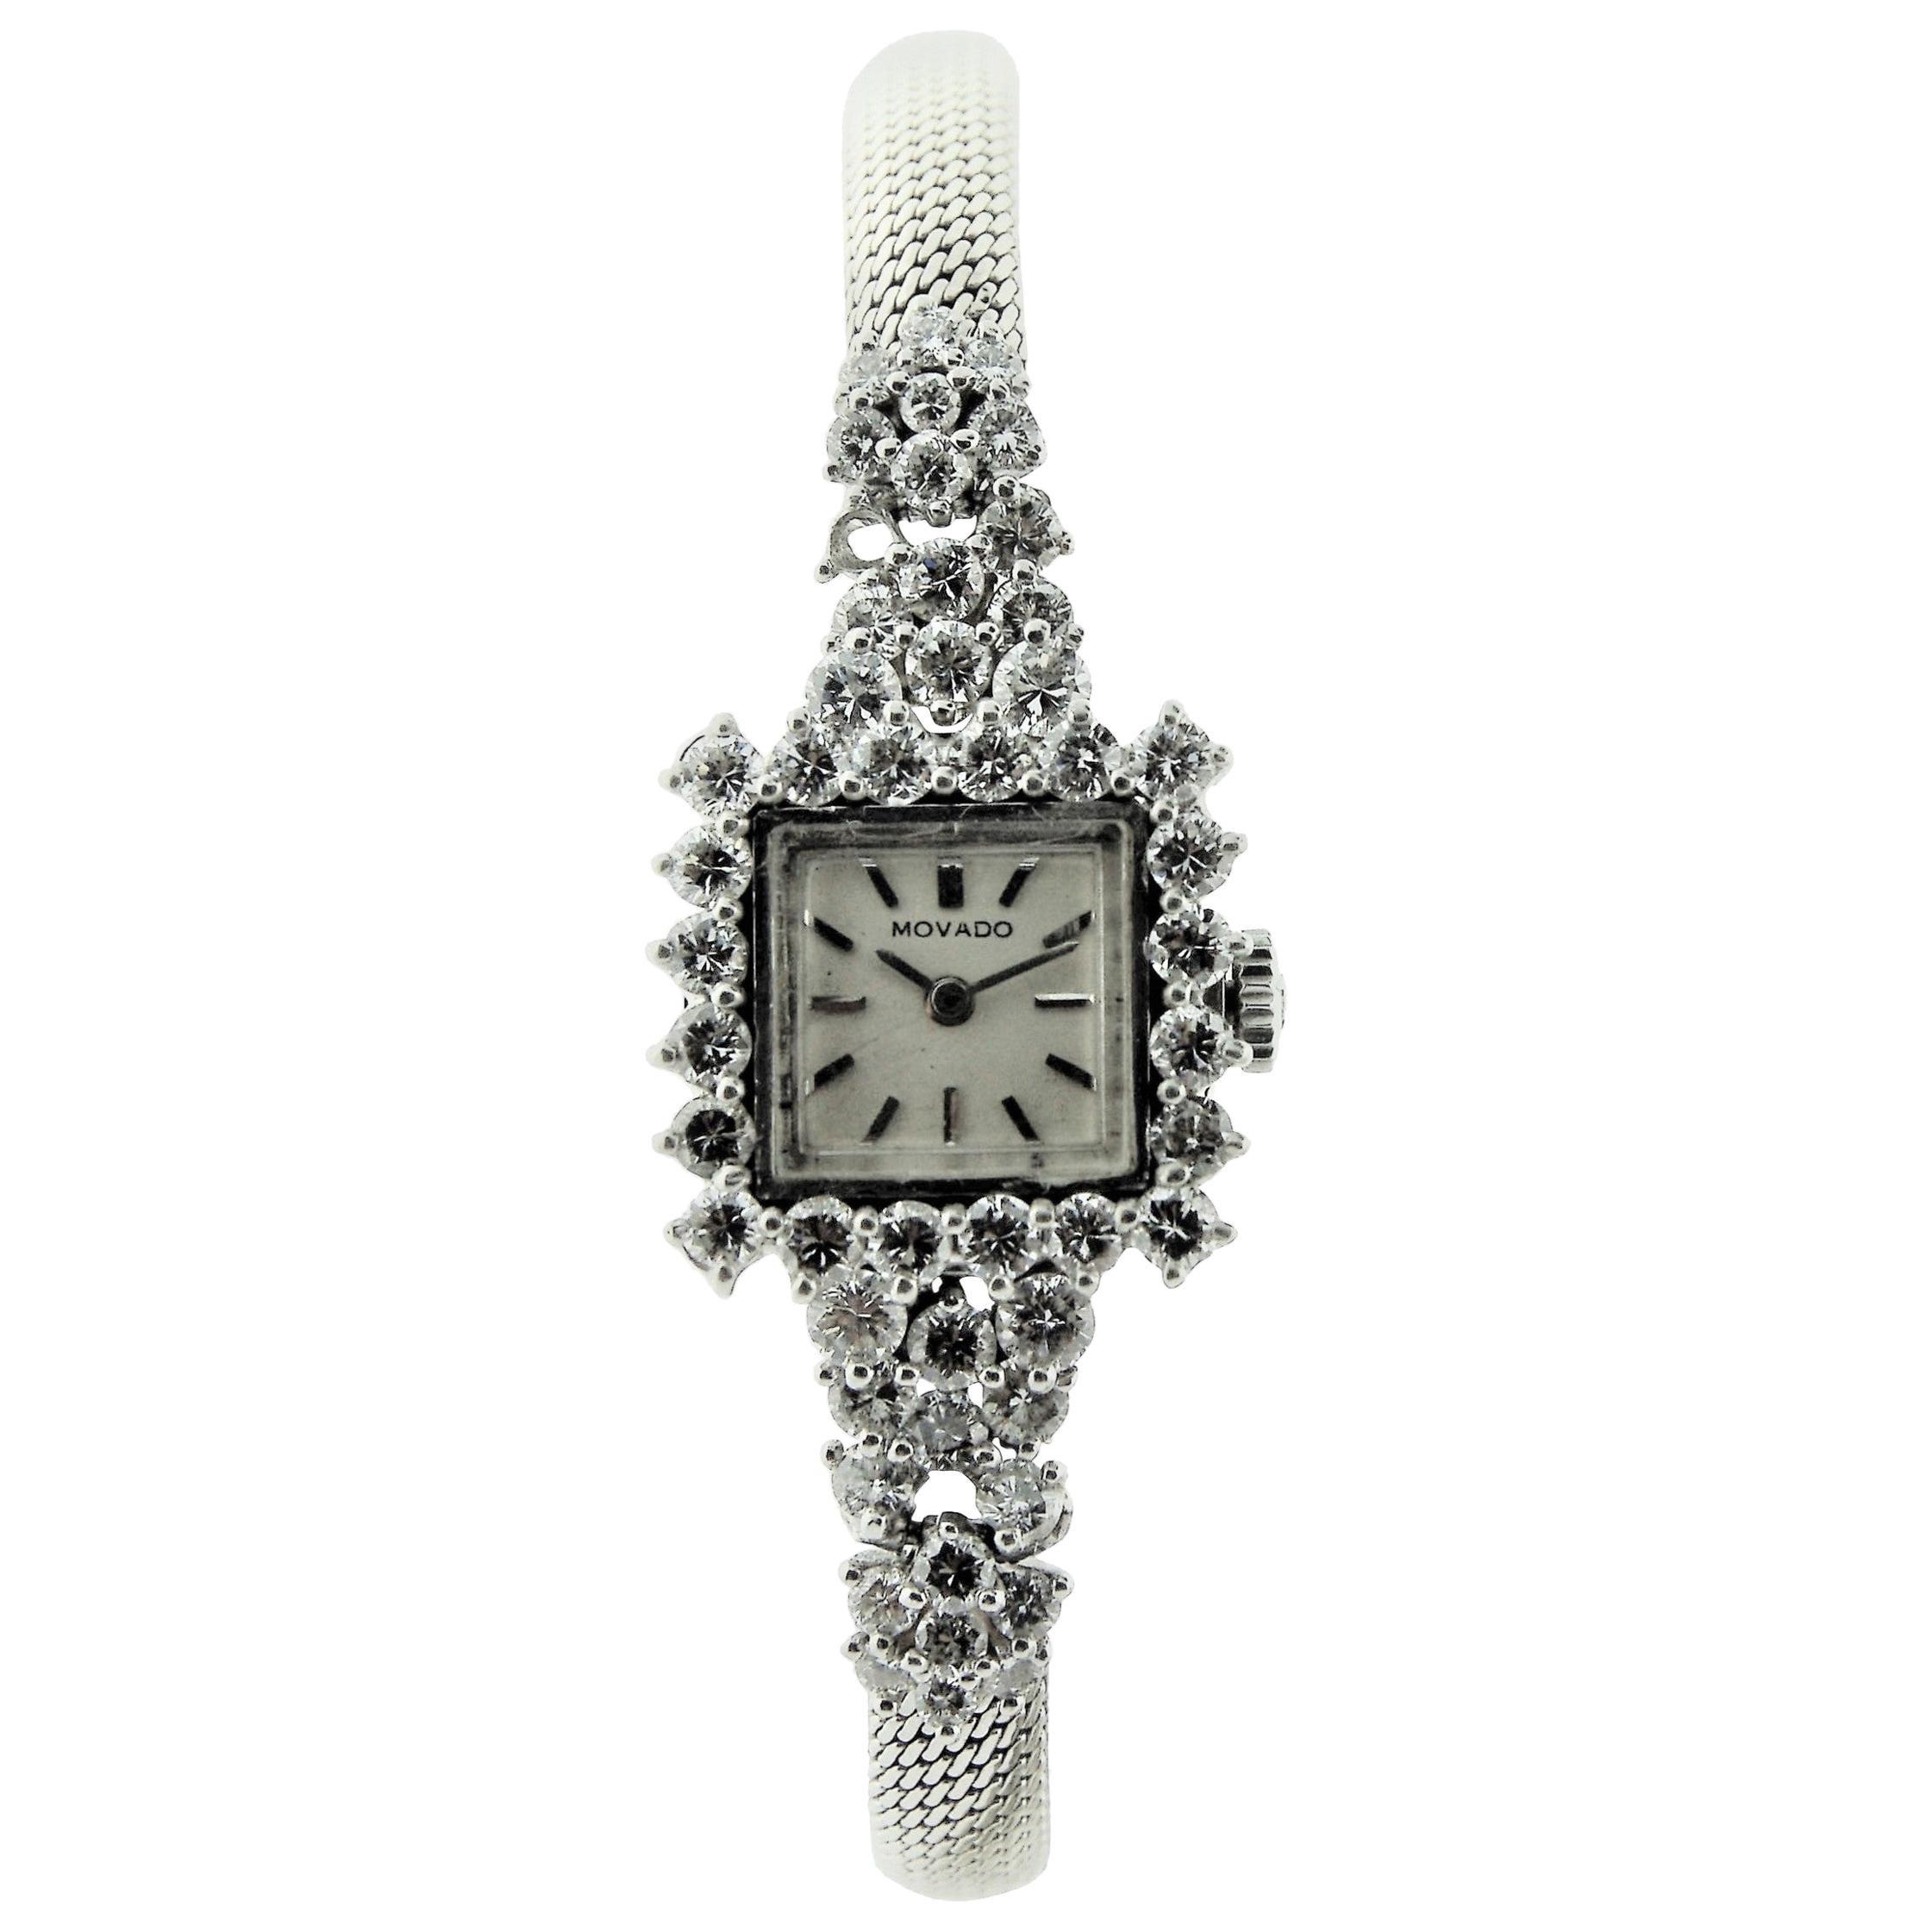 Movado Watch Company Ladies Platinum Diamond Dress Watch